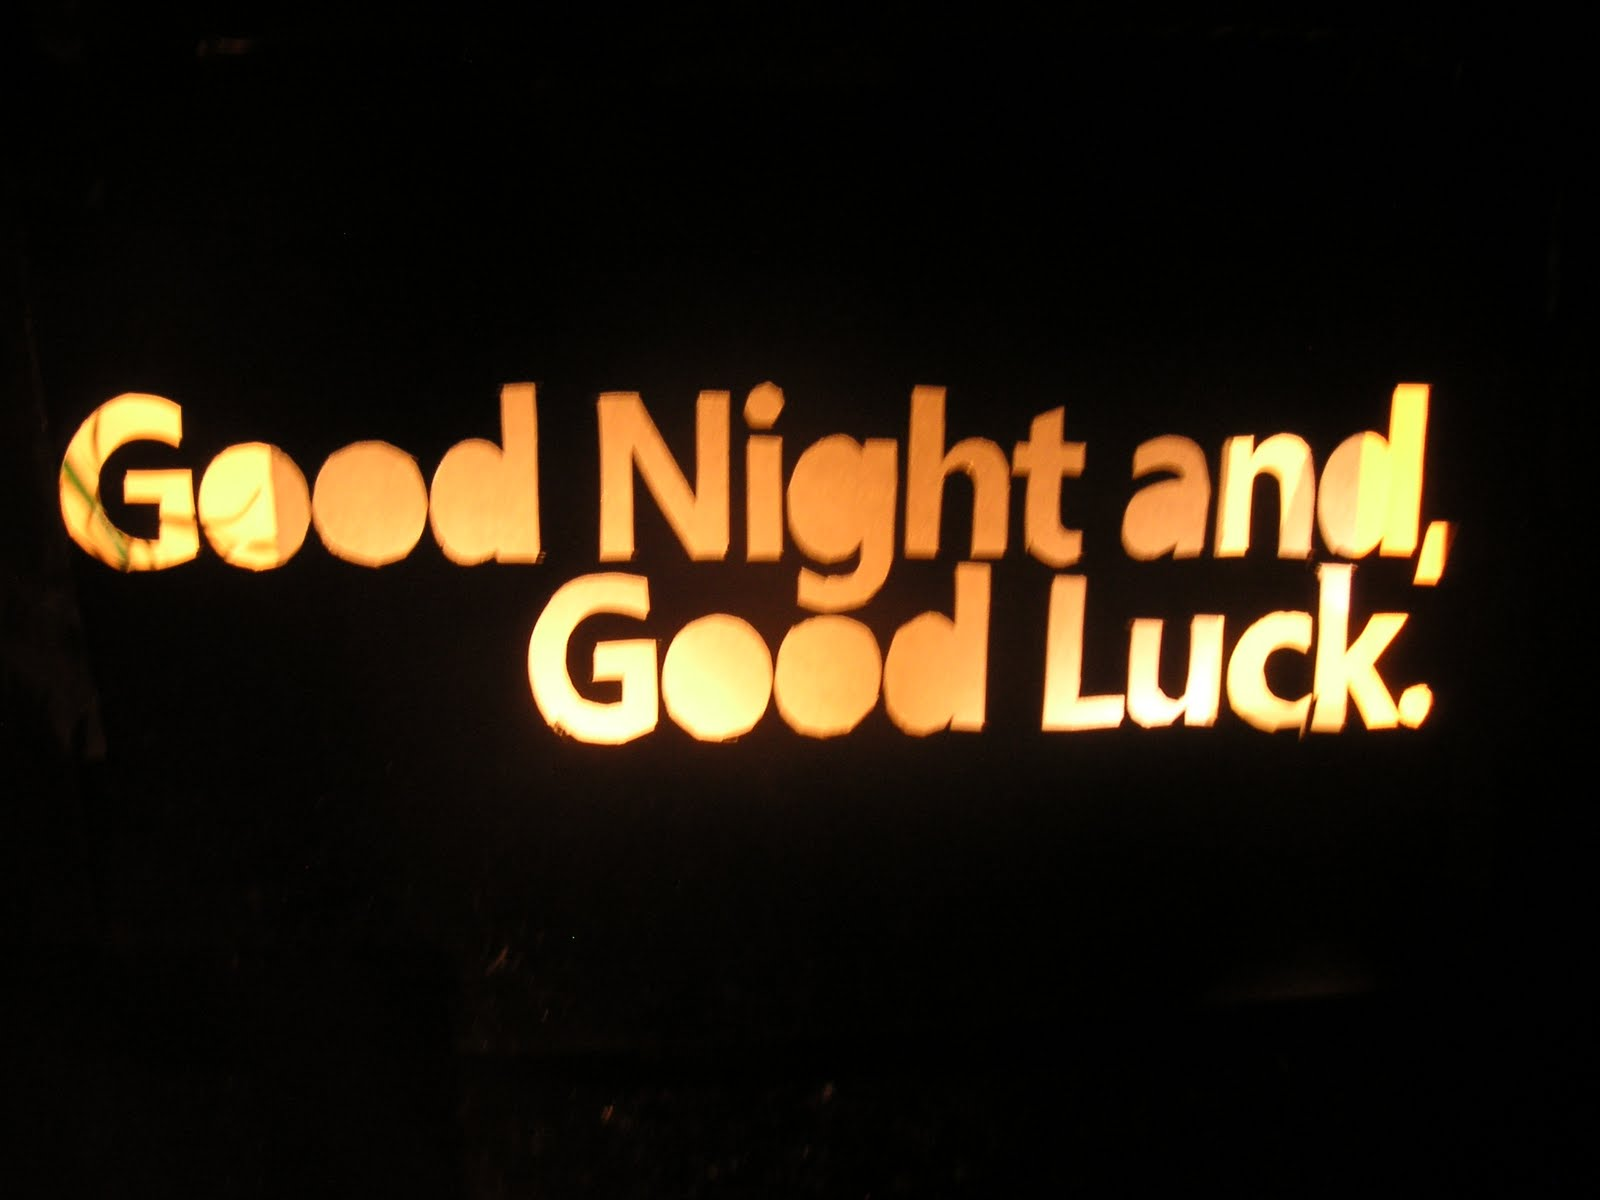 Sheldon Cooper Good Night